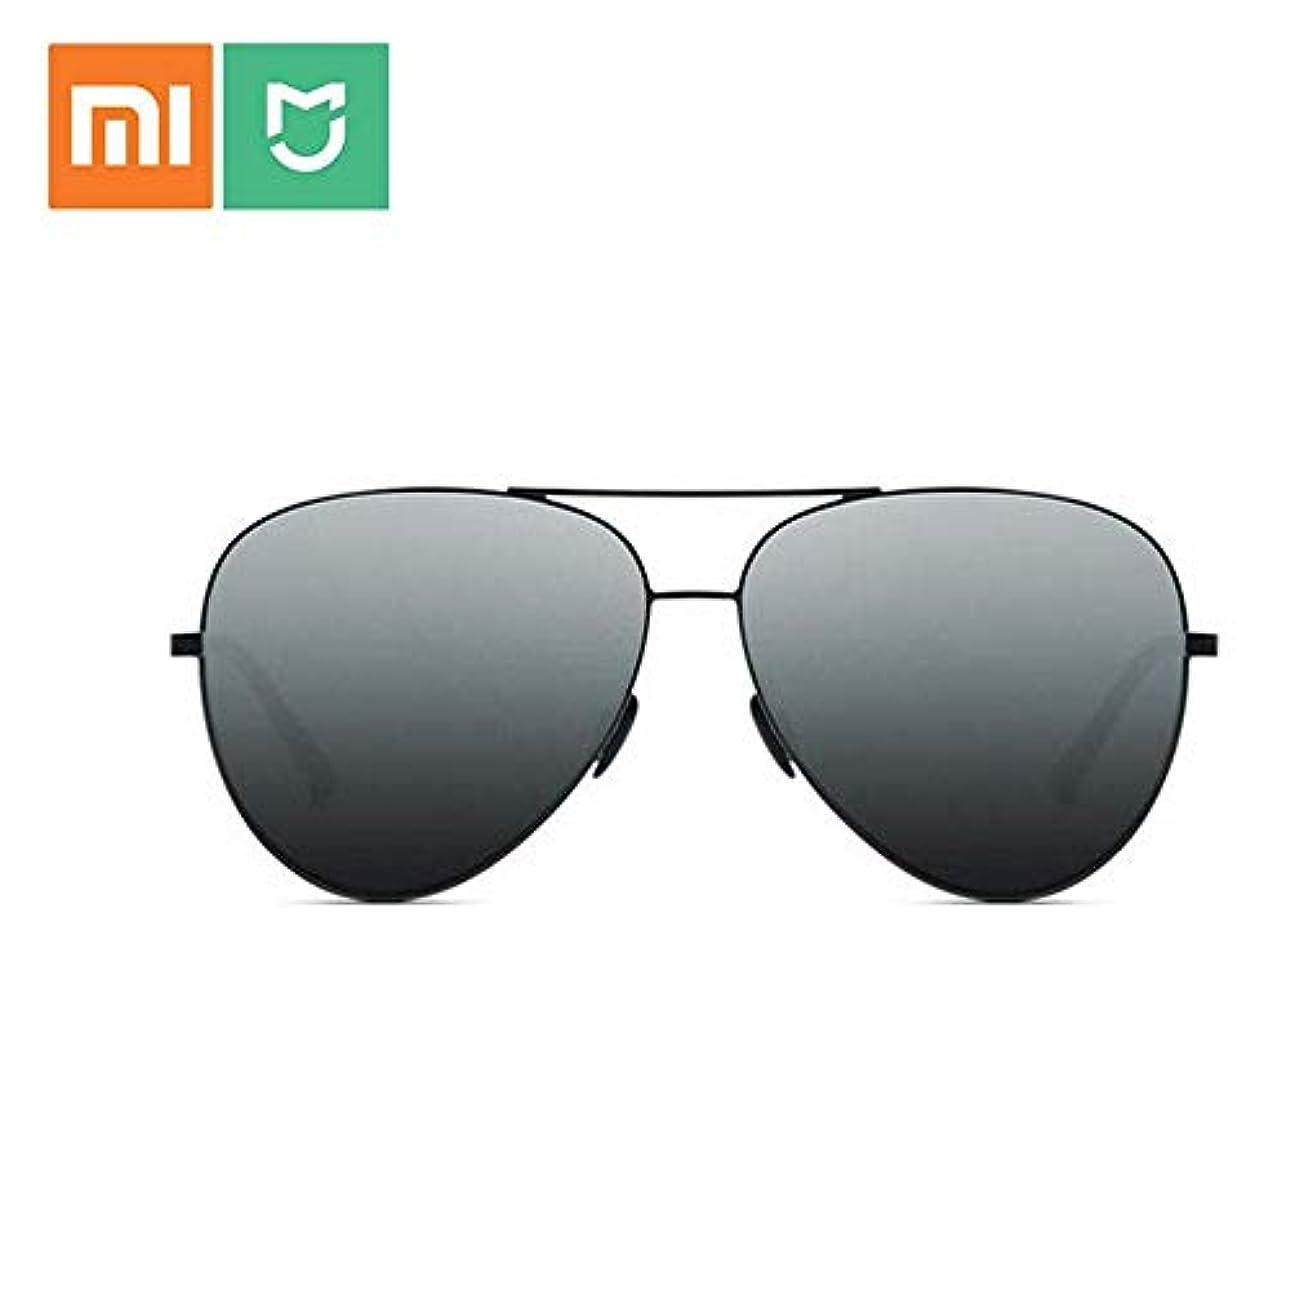 XiaomiサングラスUV400 TS偏光レンズ6層偏光フィルムメガネ